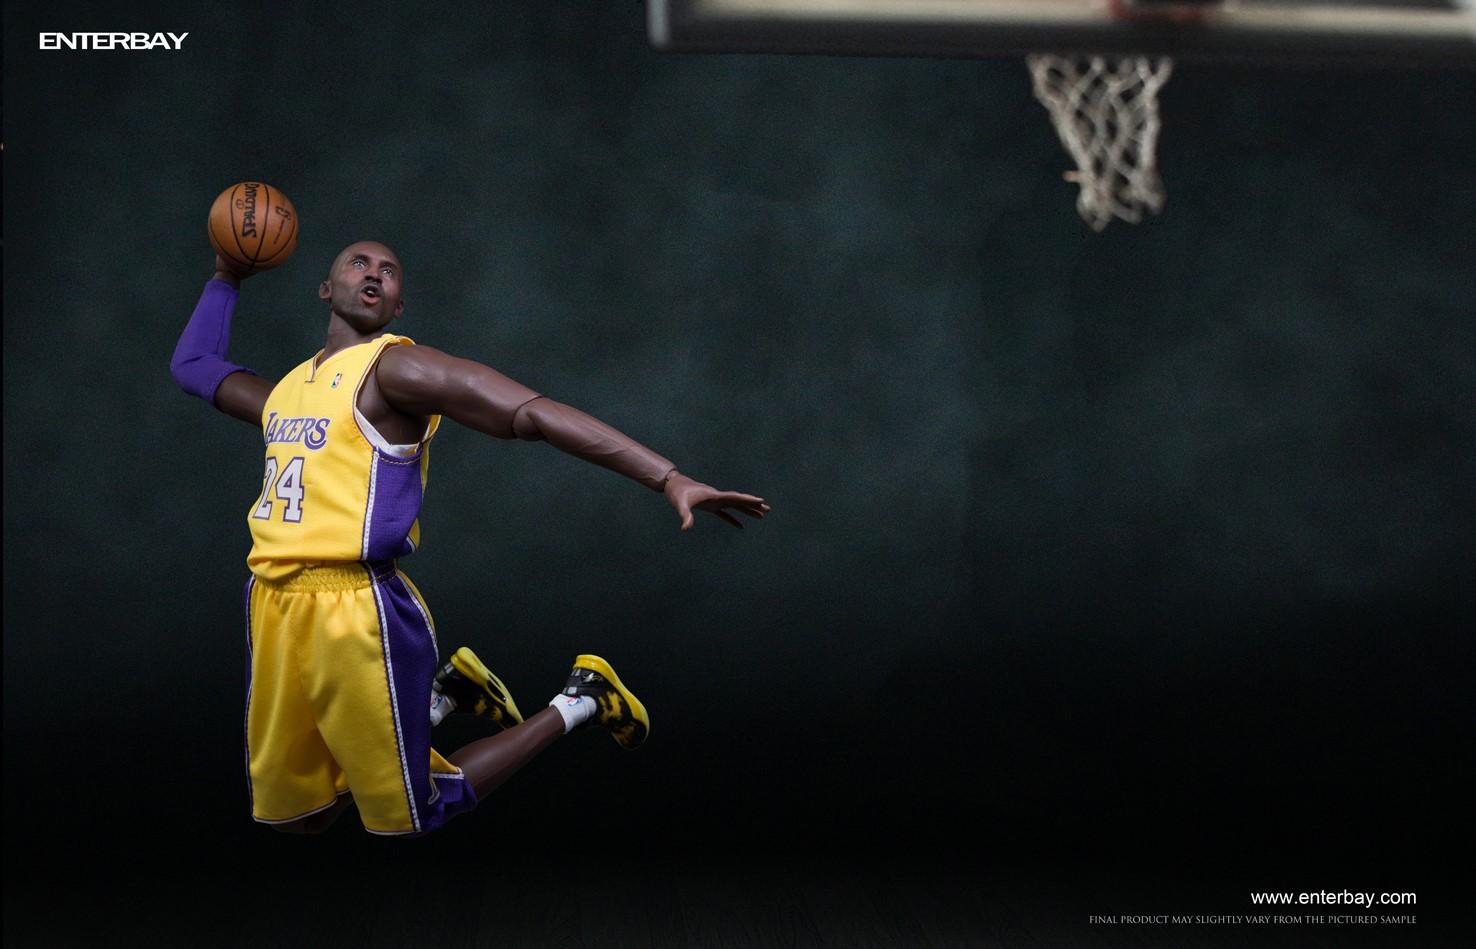 [Enterbay] NBA Real Masterpiece: Kobe Bryant 2.0 (Los Angeles Lakers) Eb5